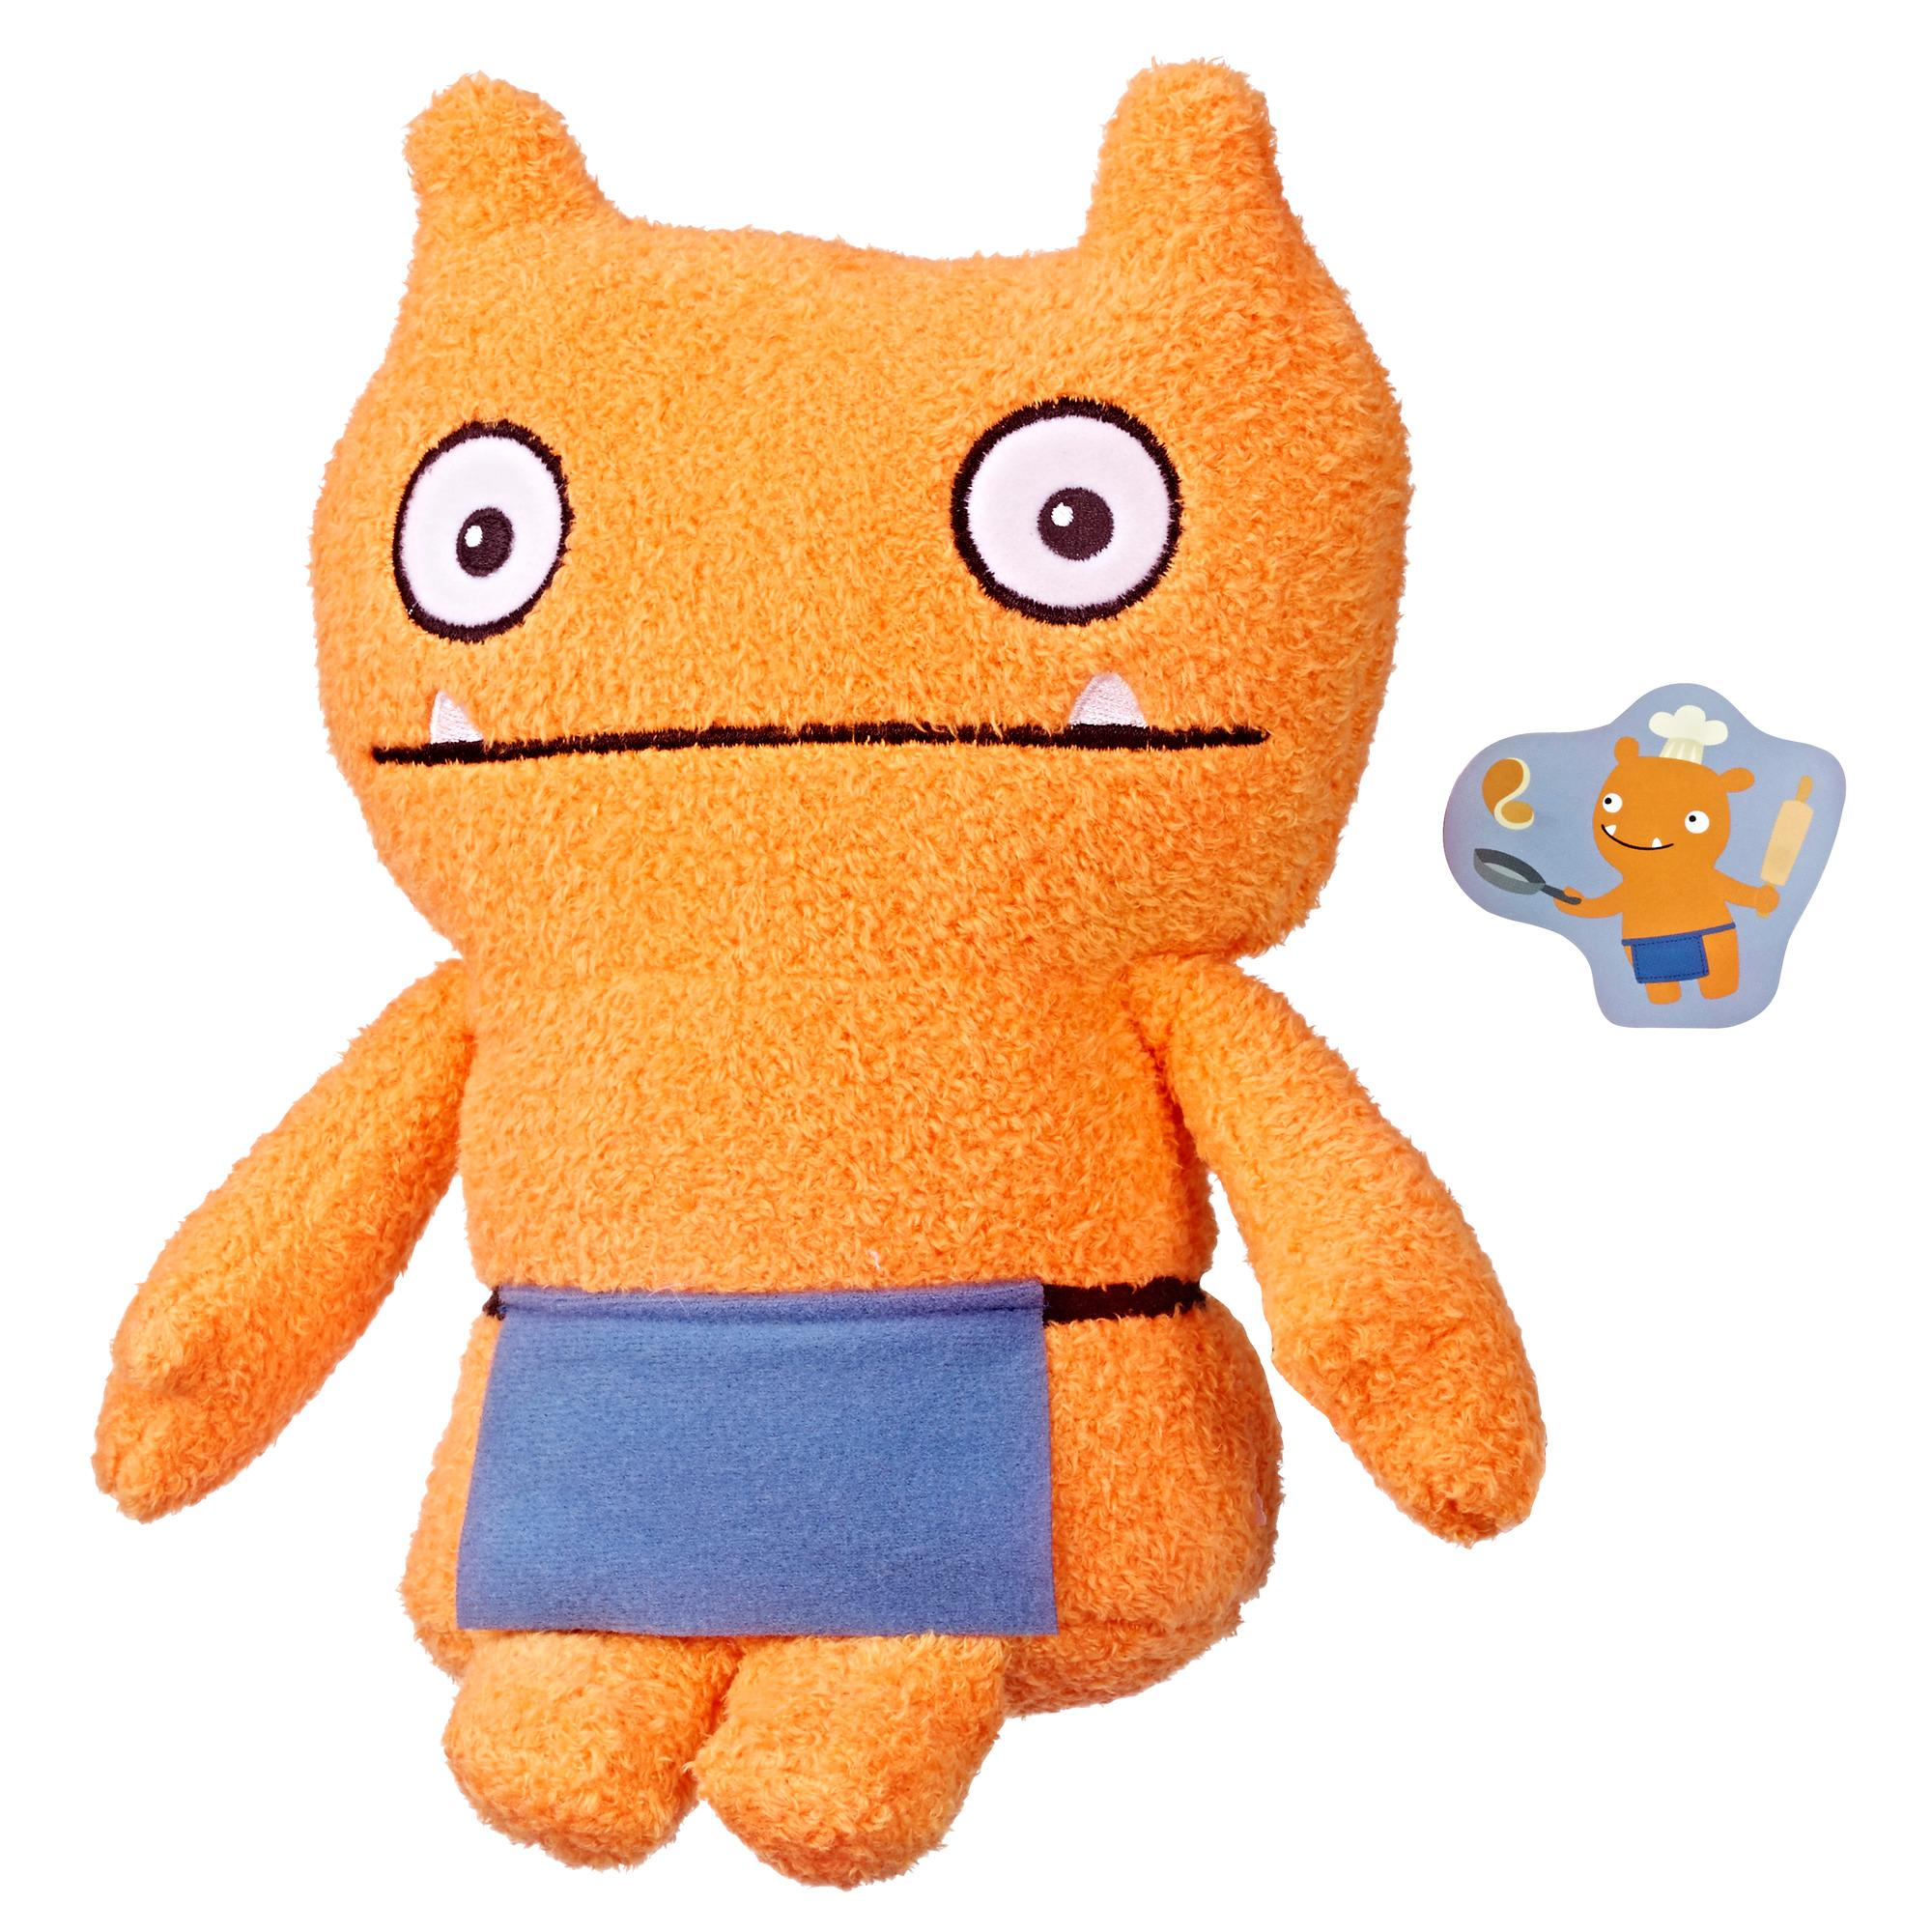 UglyDolls Warm Wishes Wage Stuffed Plush Toy, 10 inches tall